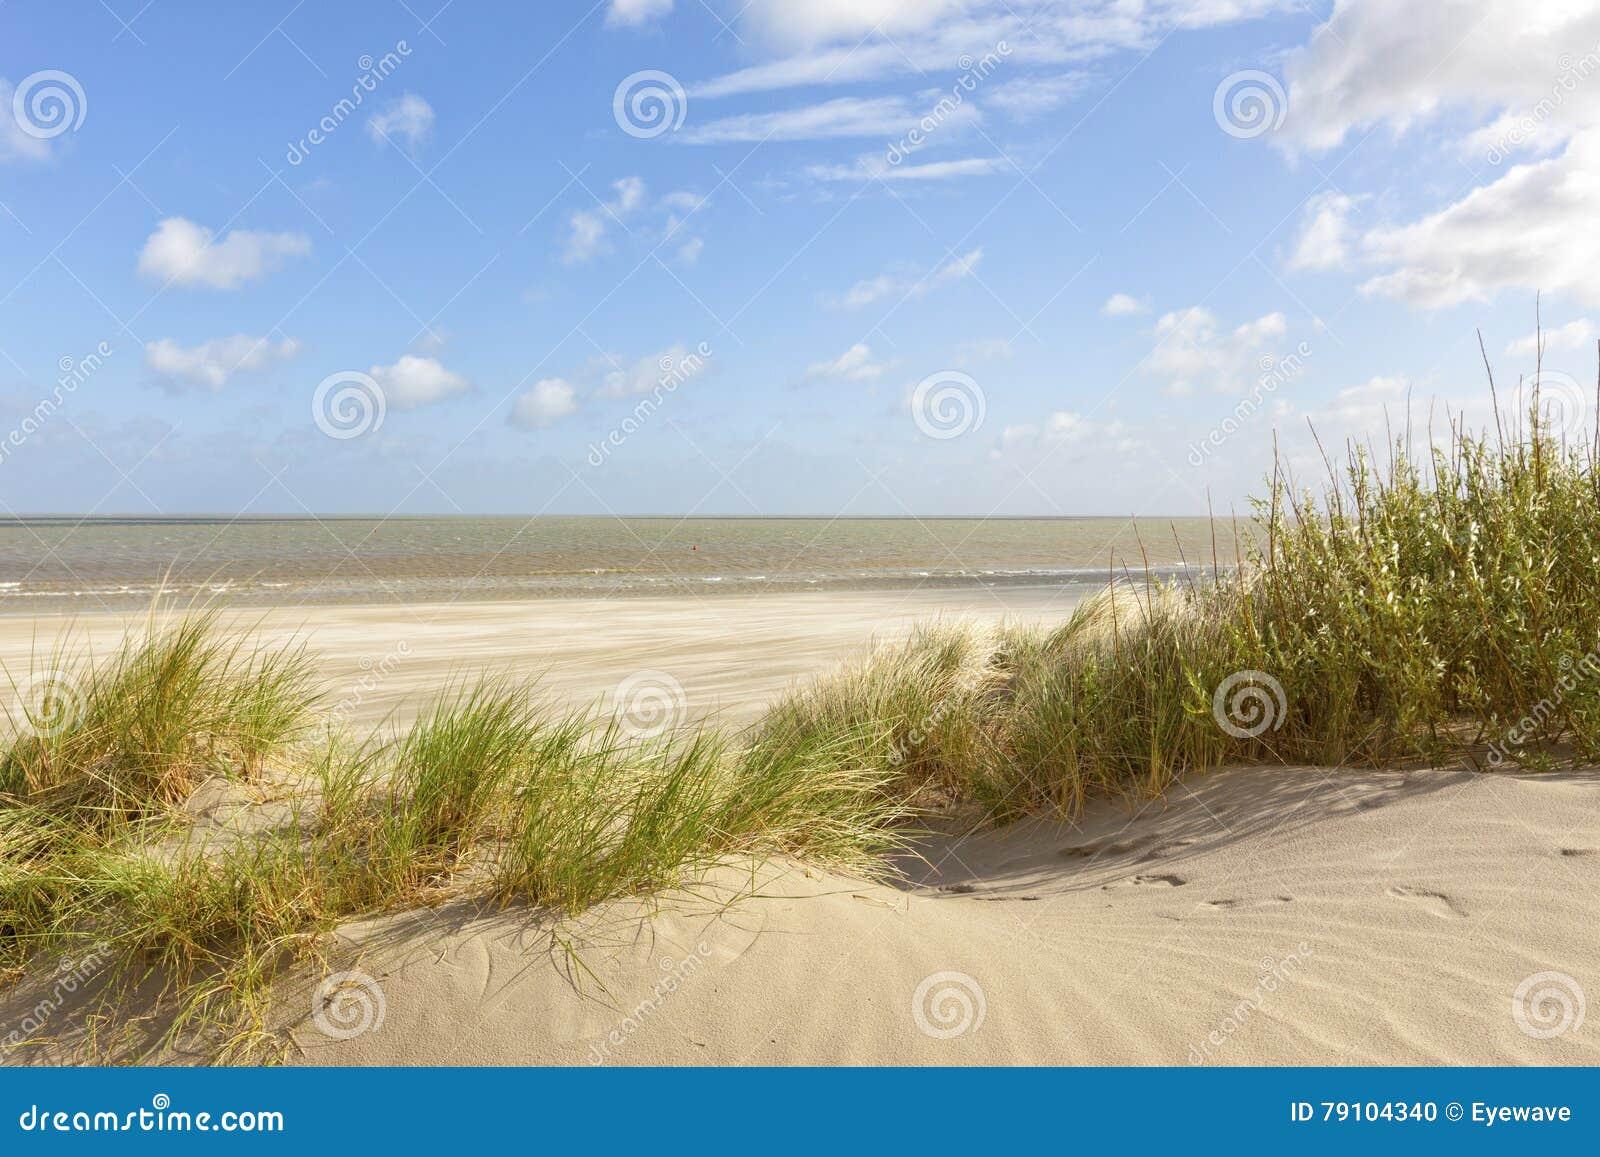 Plage De La Mer Du Nord De Belge Au Knokke Cambriolage